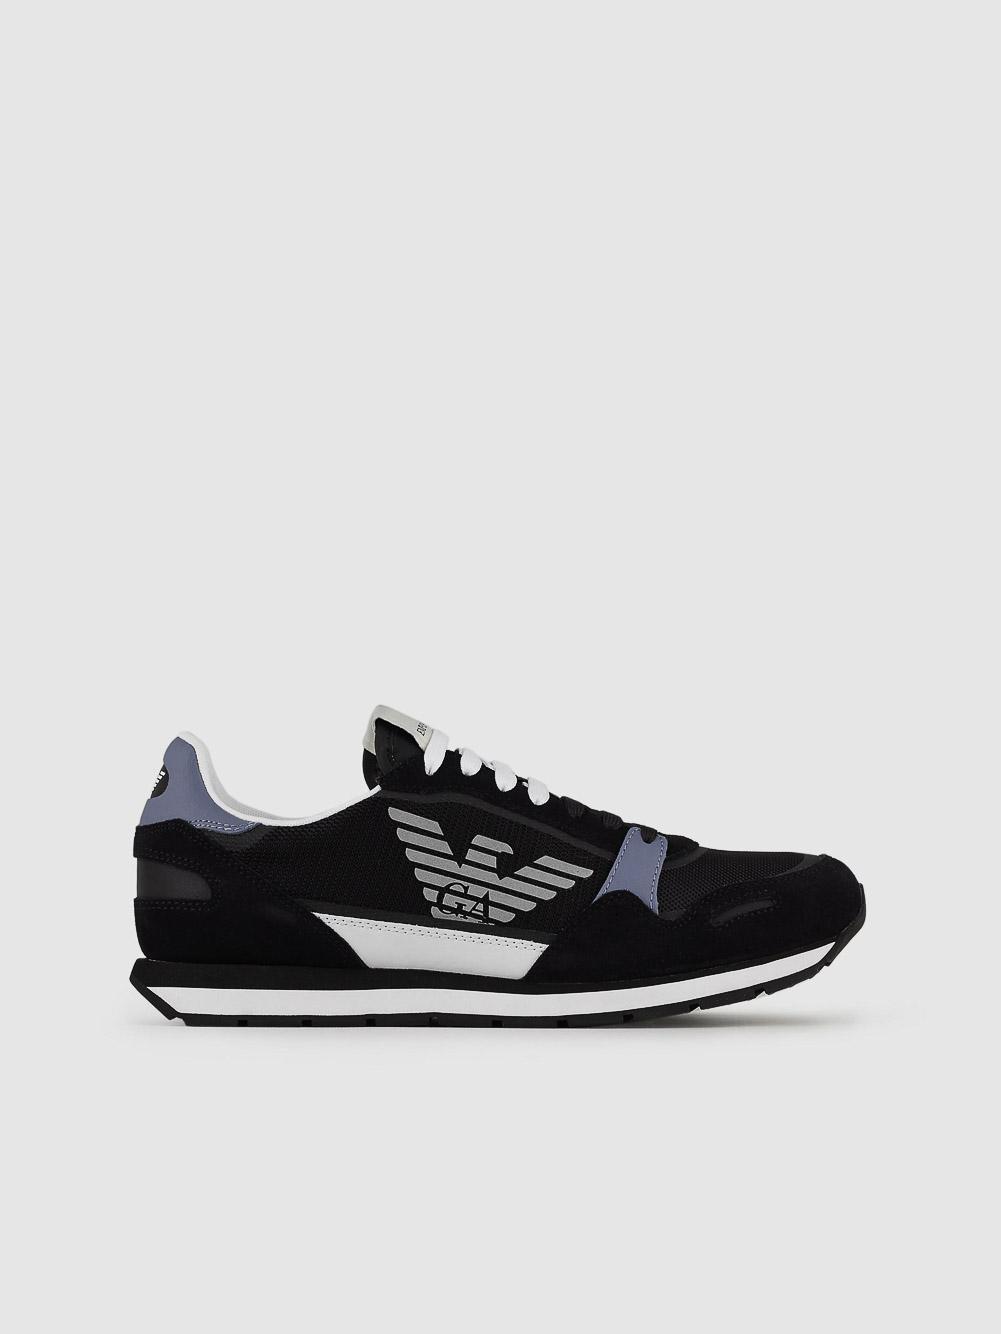 EMPORIO ARMANI Παπούτσια Sneaker X4X537XM678-Q092 ΕΜΠΡΙΜΕ